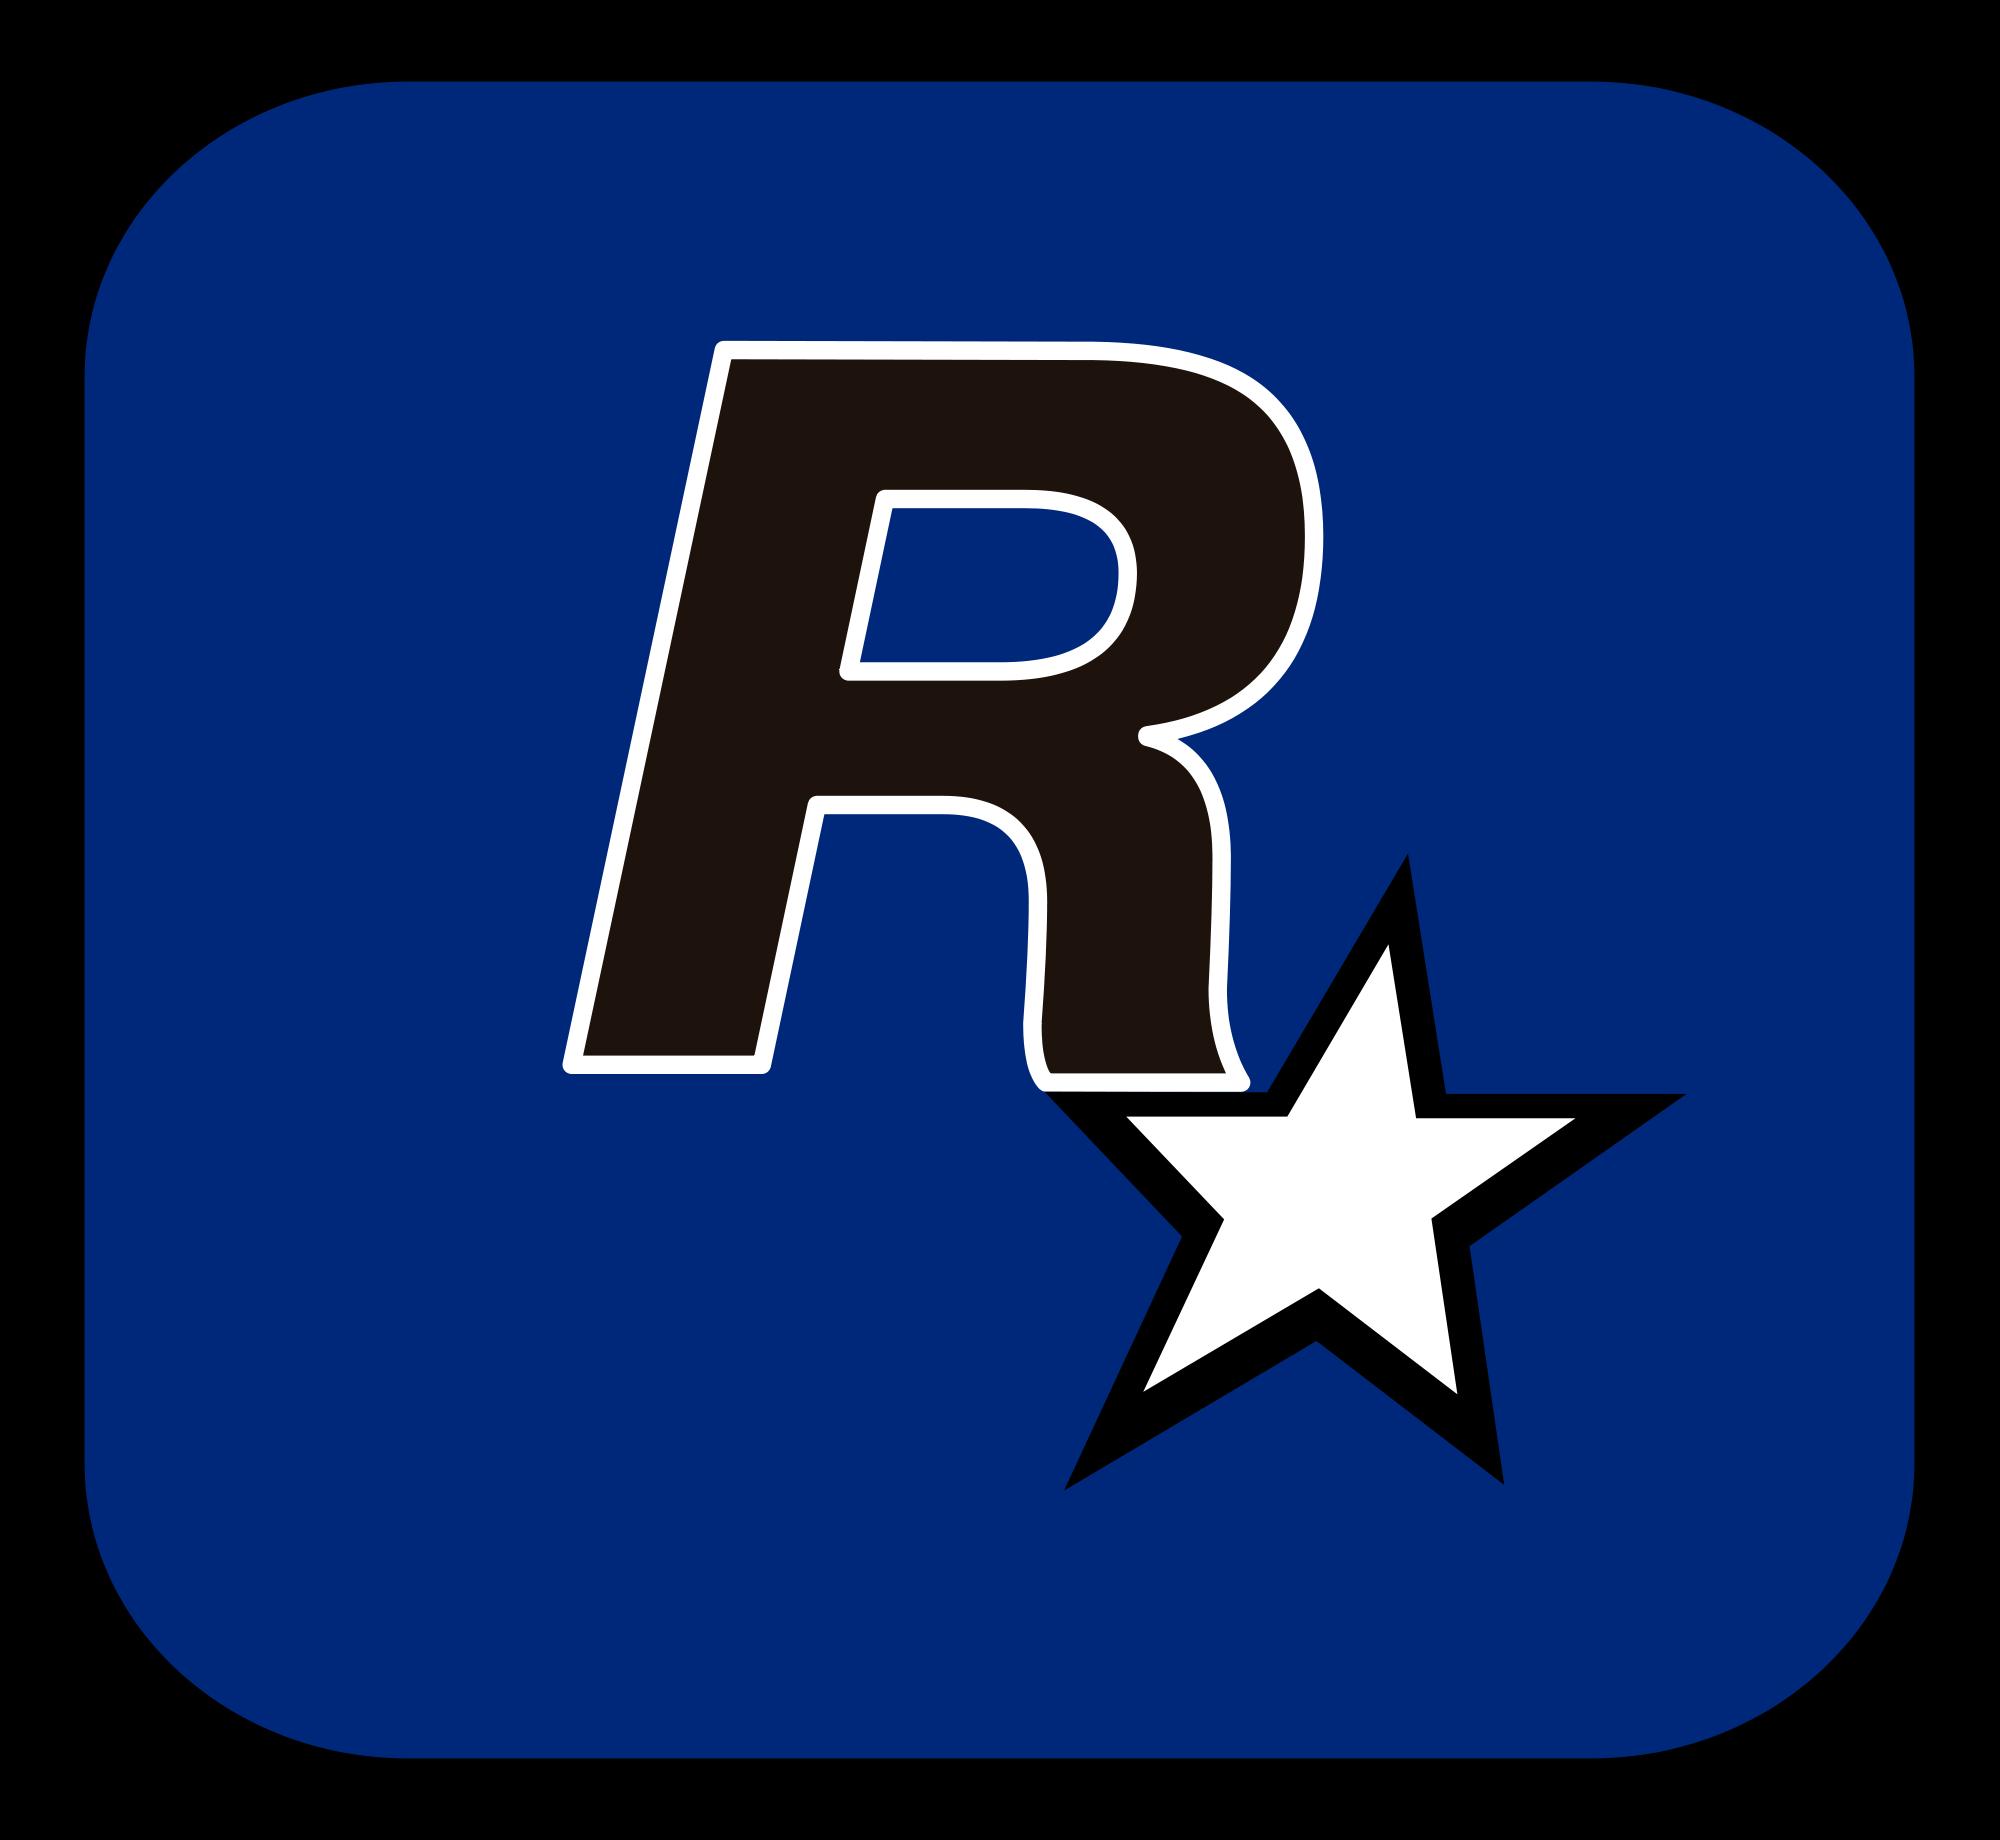 Rockstar Games - GTA Wiki, the Grand Theft Auto Wiki - GTA ...